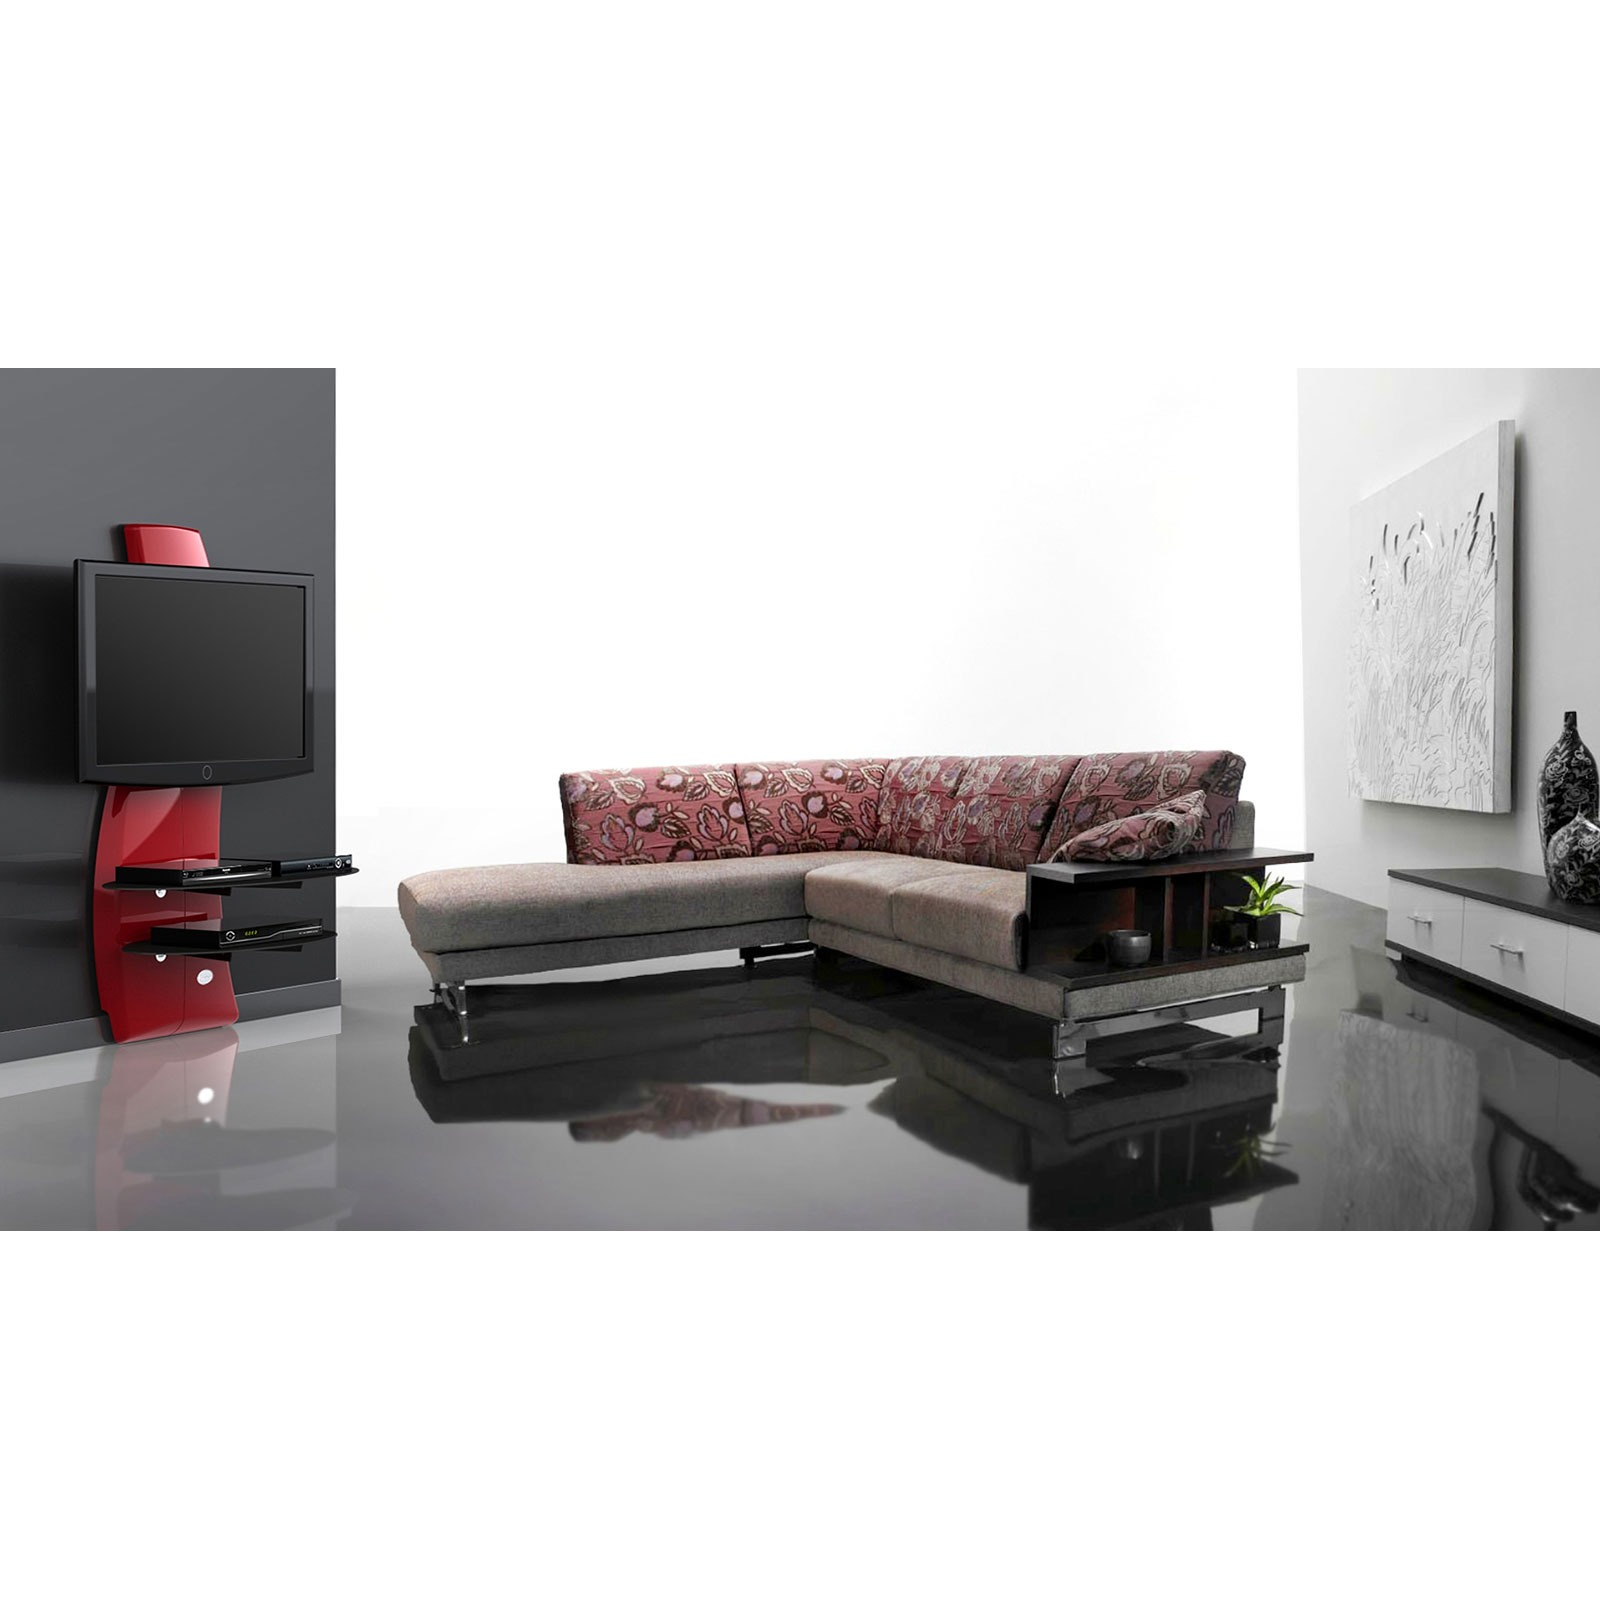 meliconi ghost design 2000 (488070) : achat / vente meuble tv sur ... - Meuble Tv Mural Meliconi Ghost Design 2000